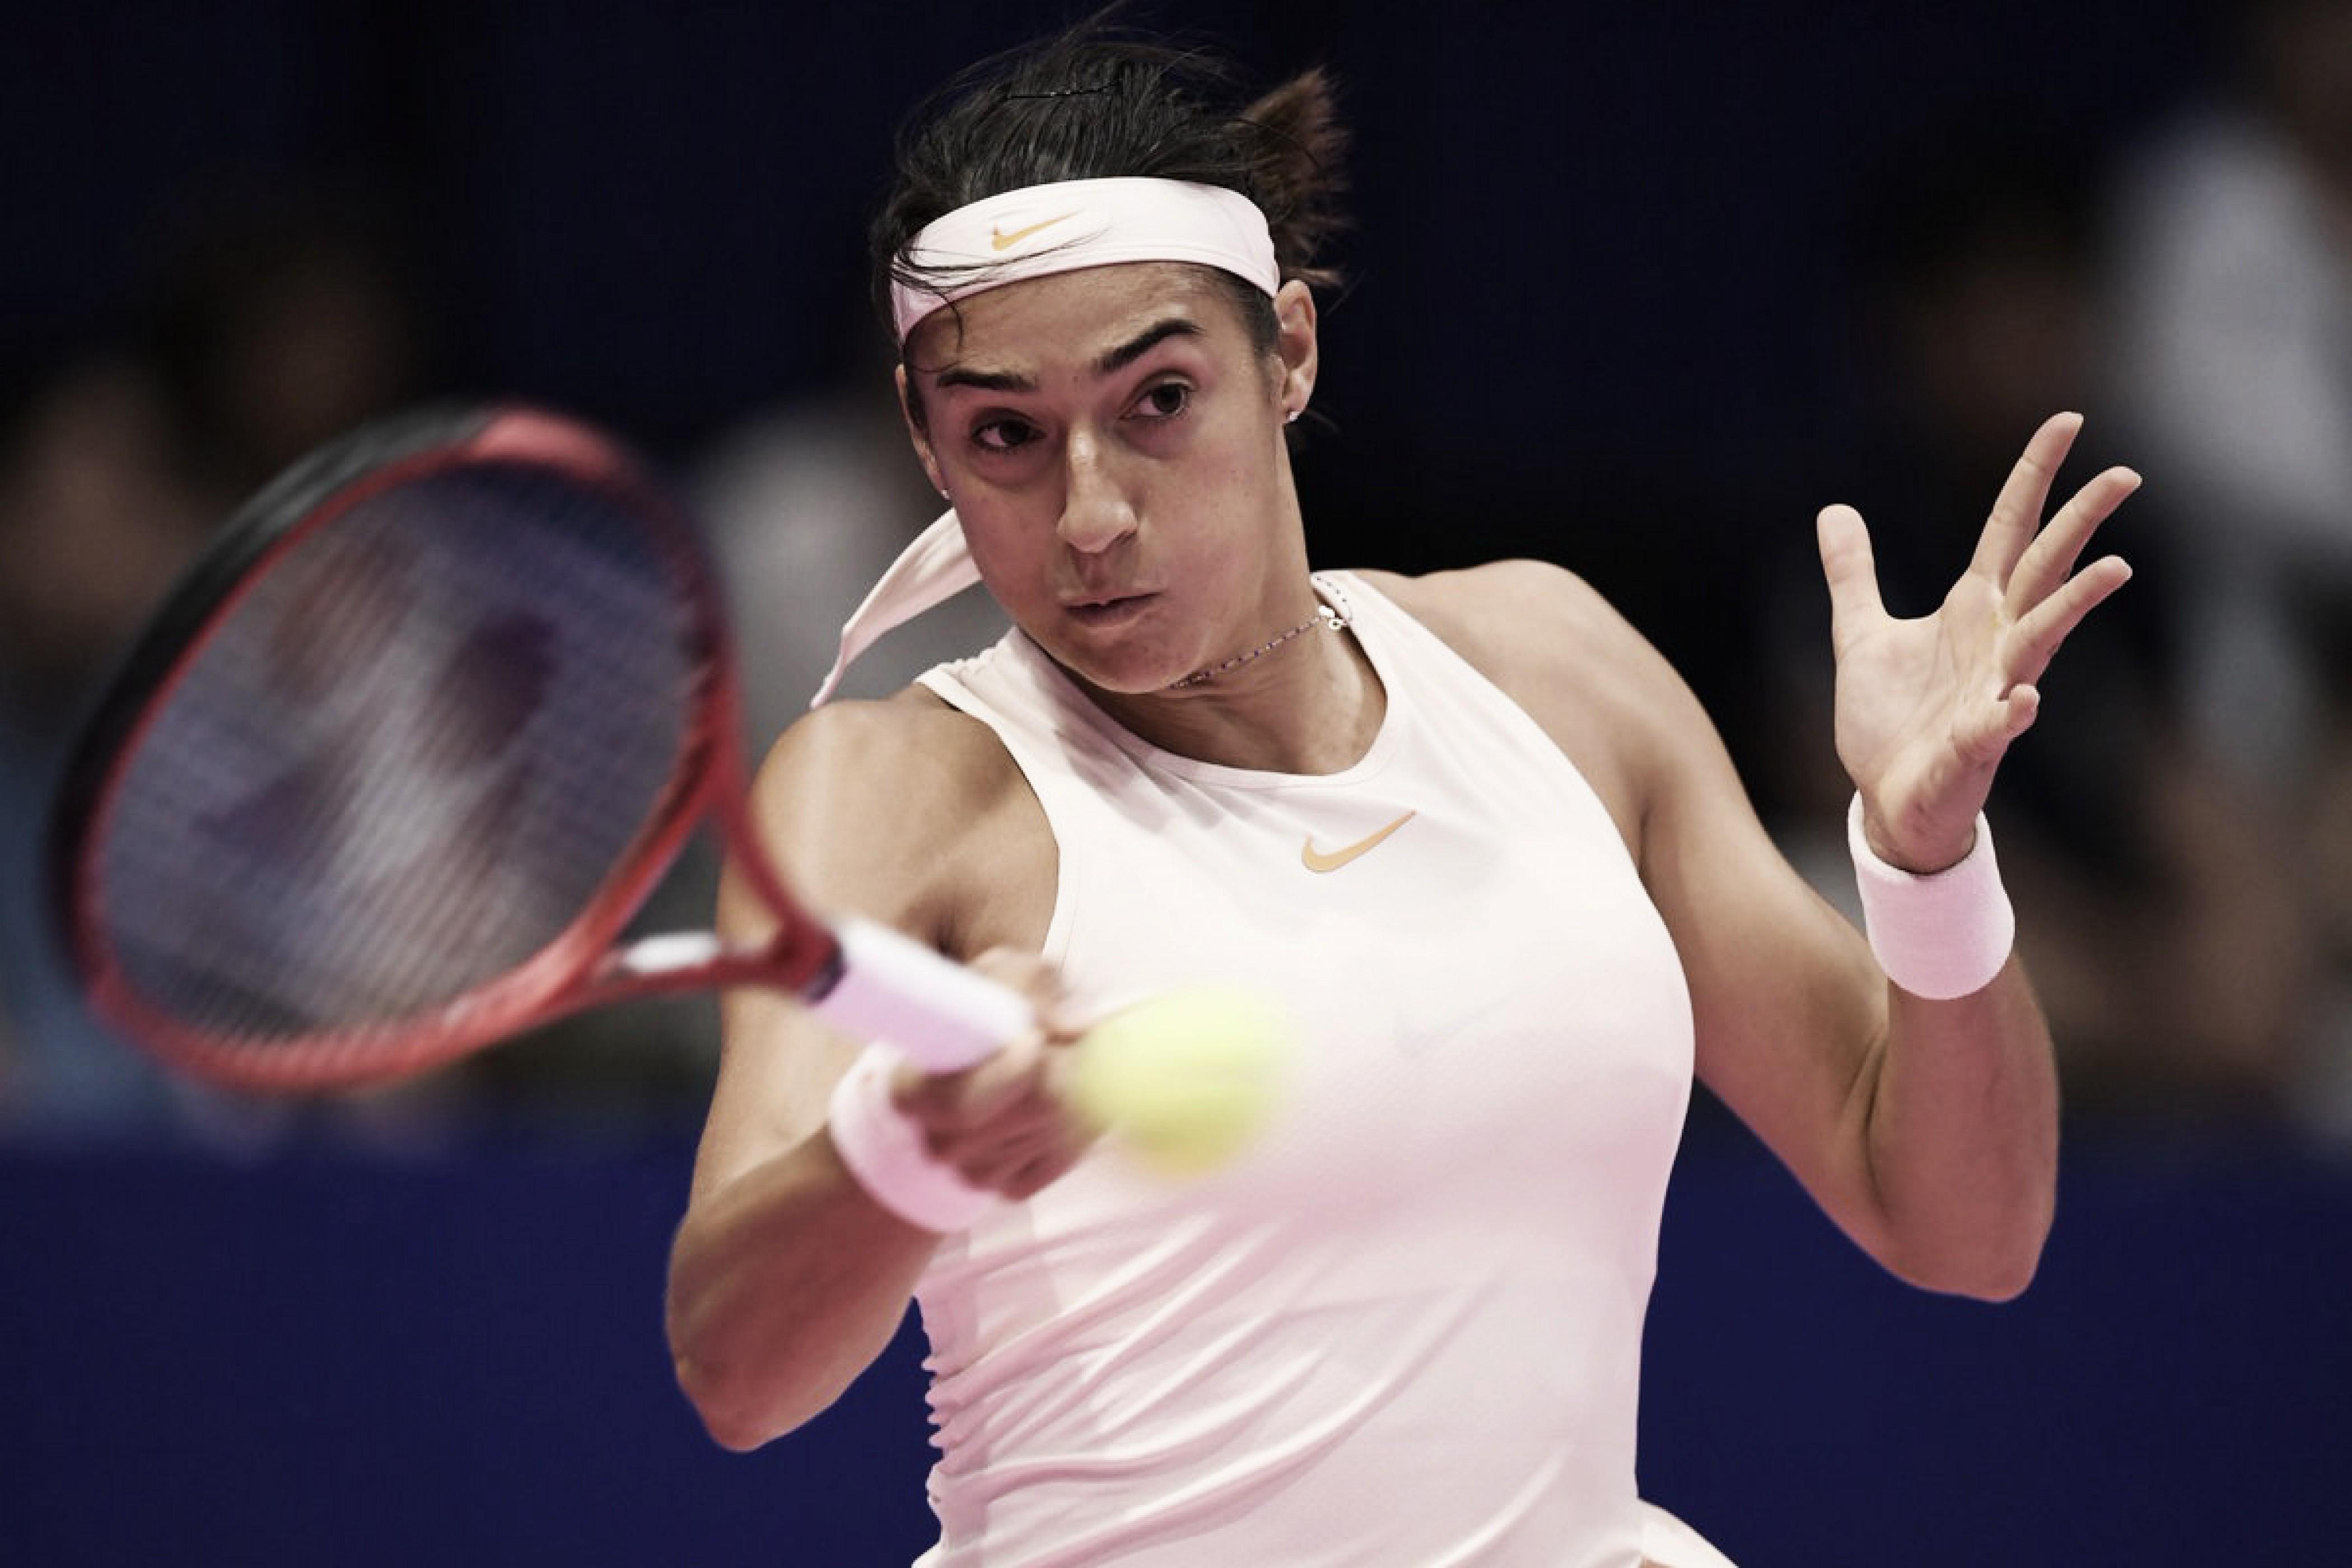 Garcia salva match points e elimina Pavlyuchenkova em Tóquio